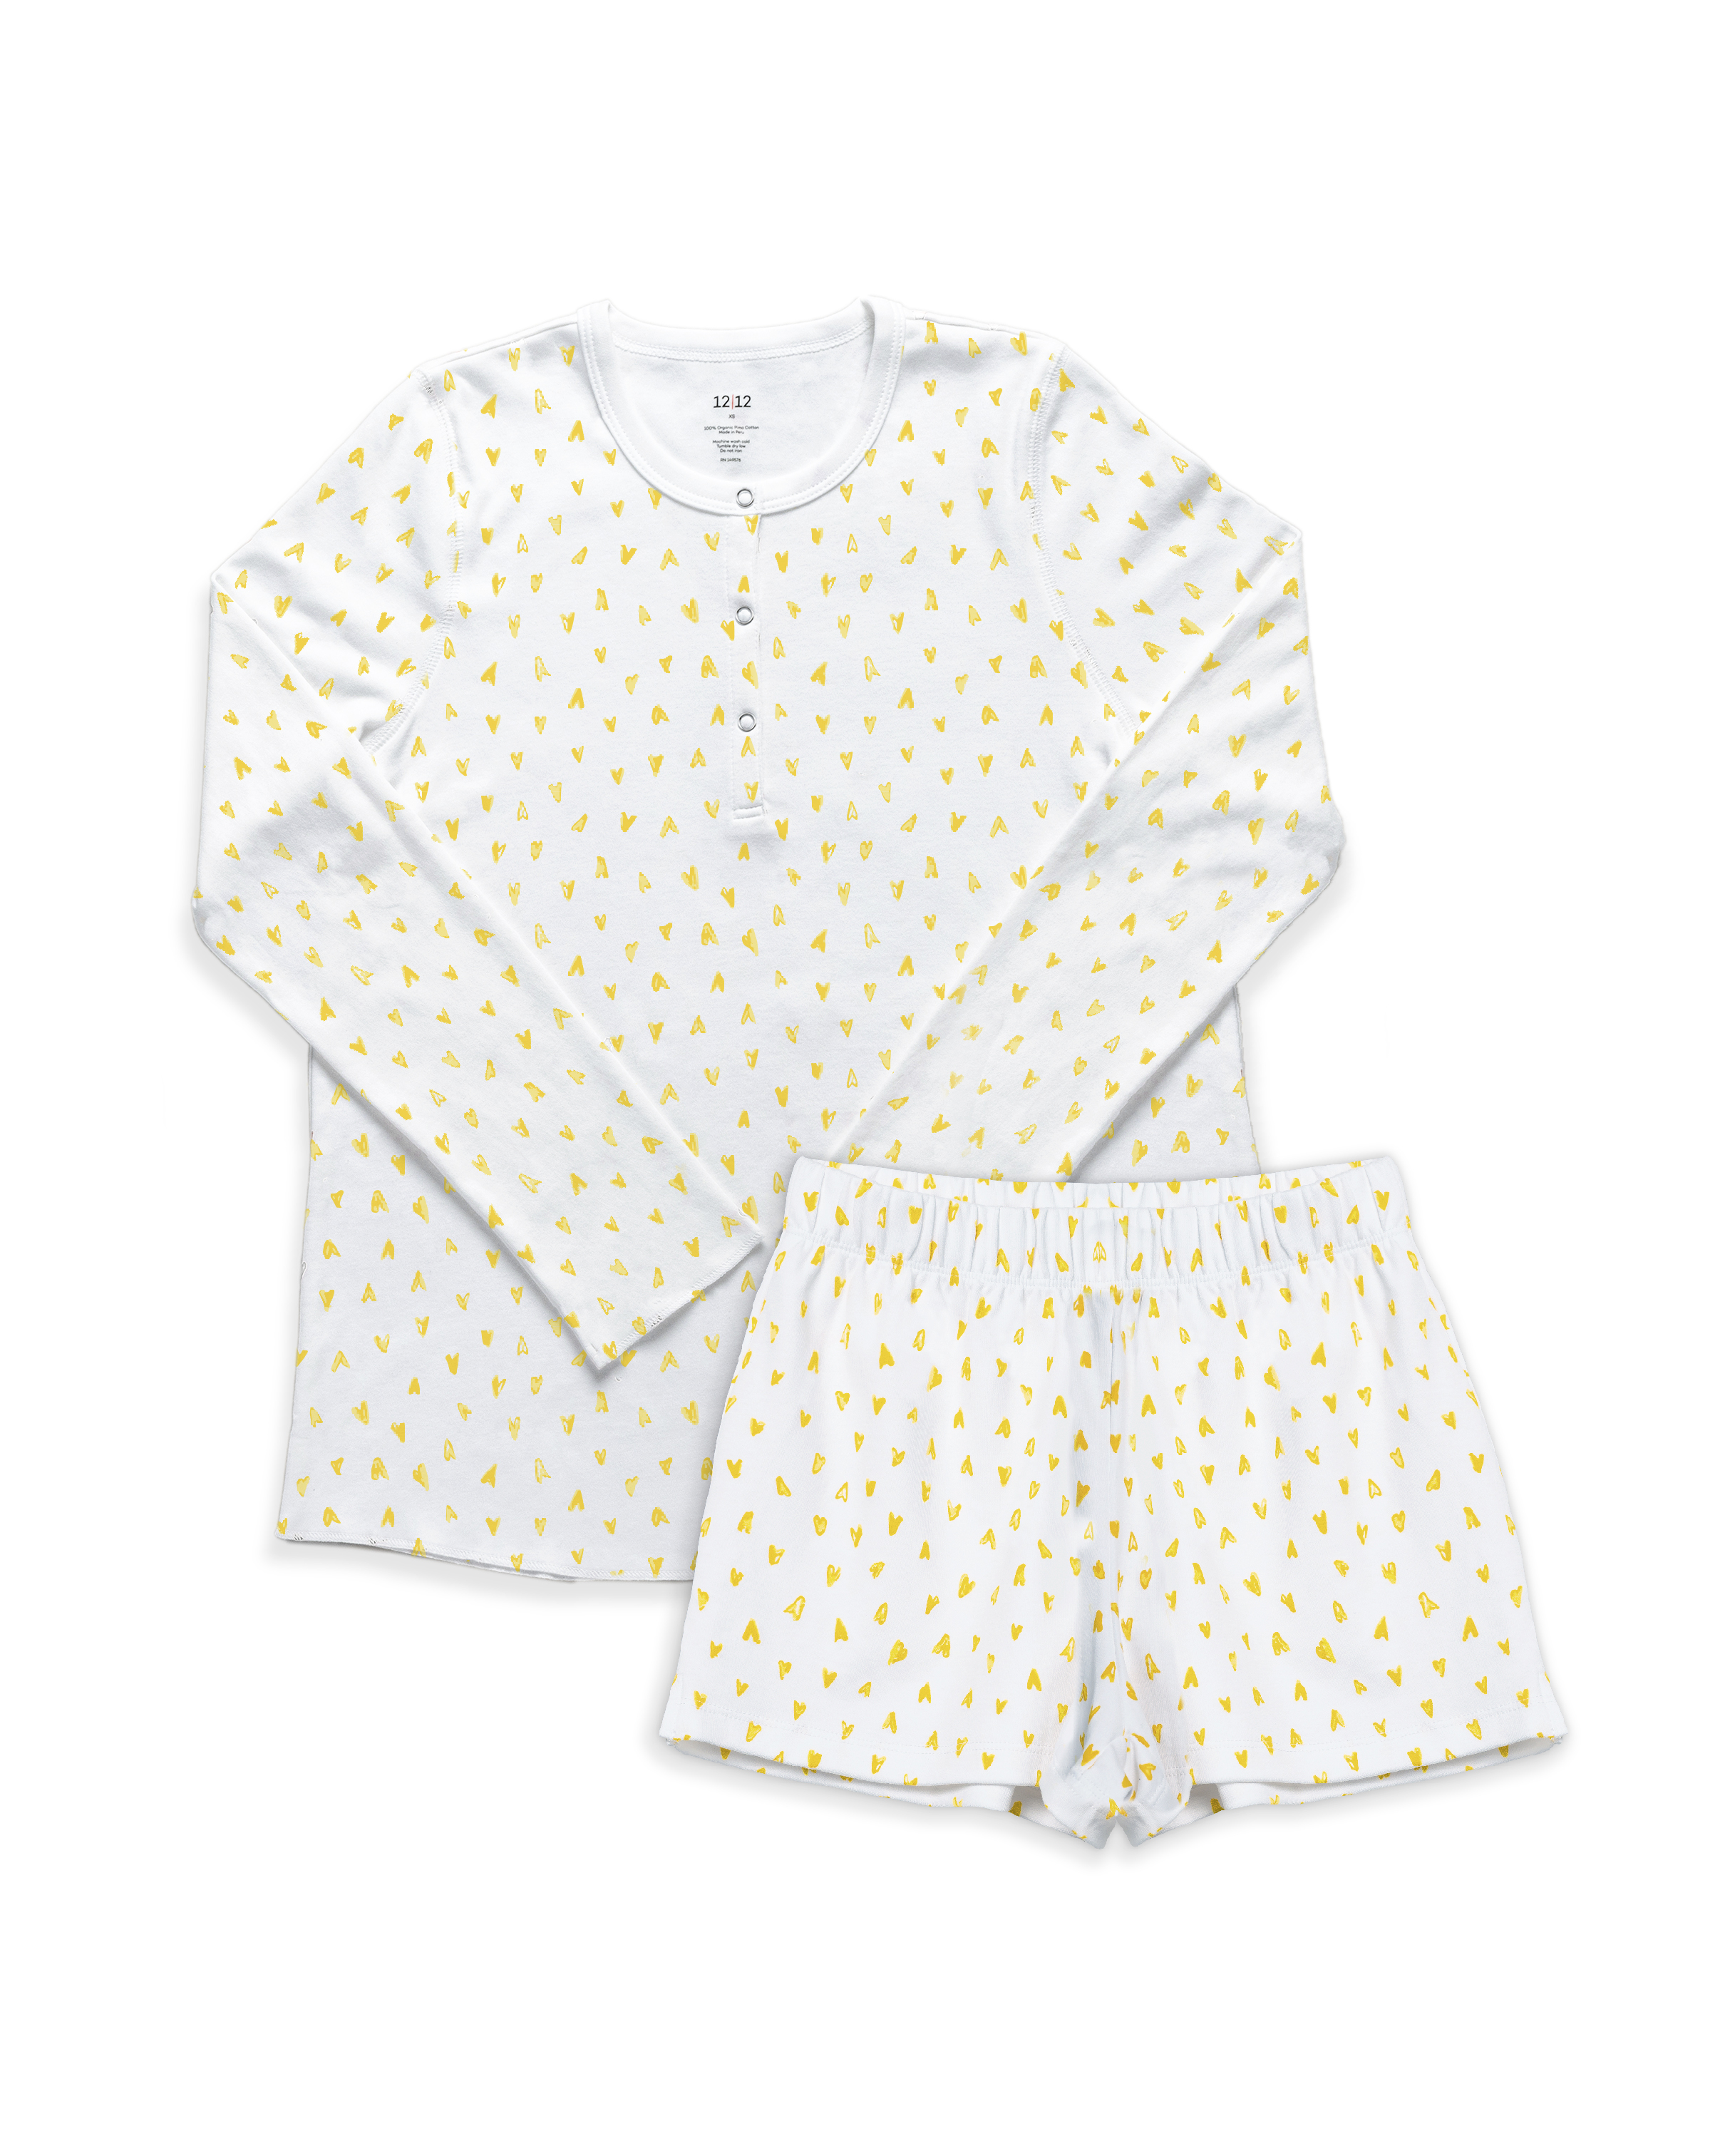 Mama | Me Pajama Set with Shorts